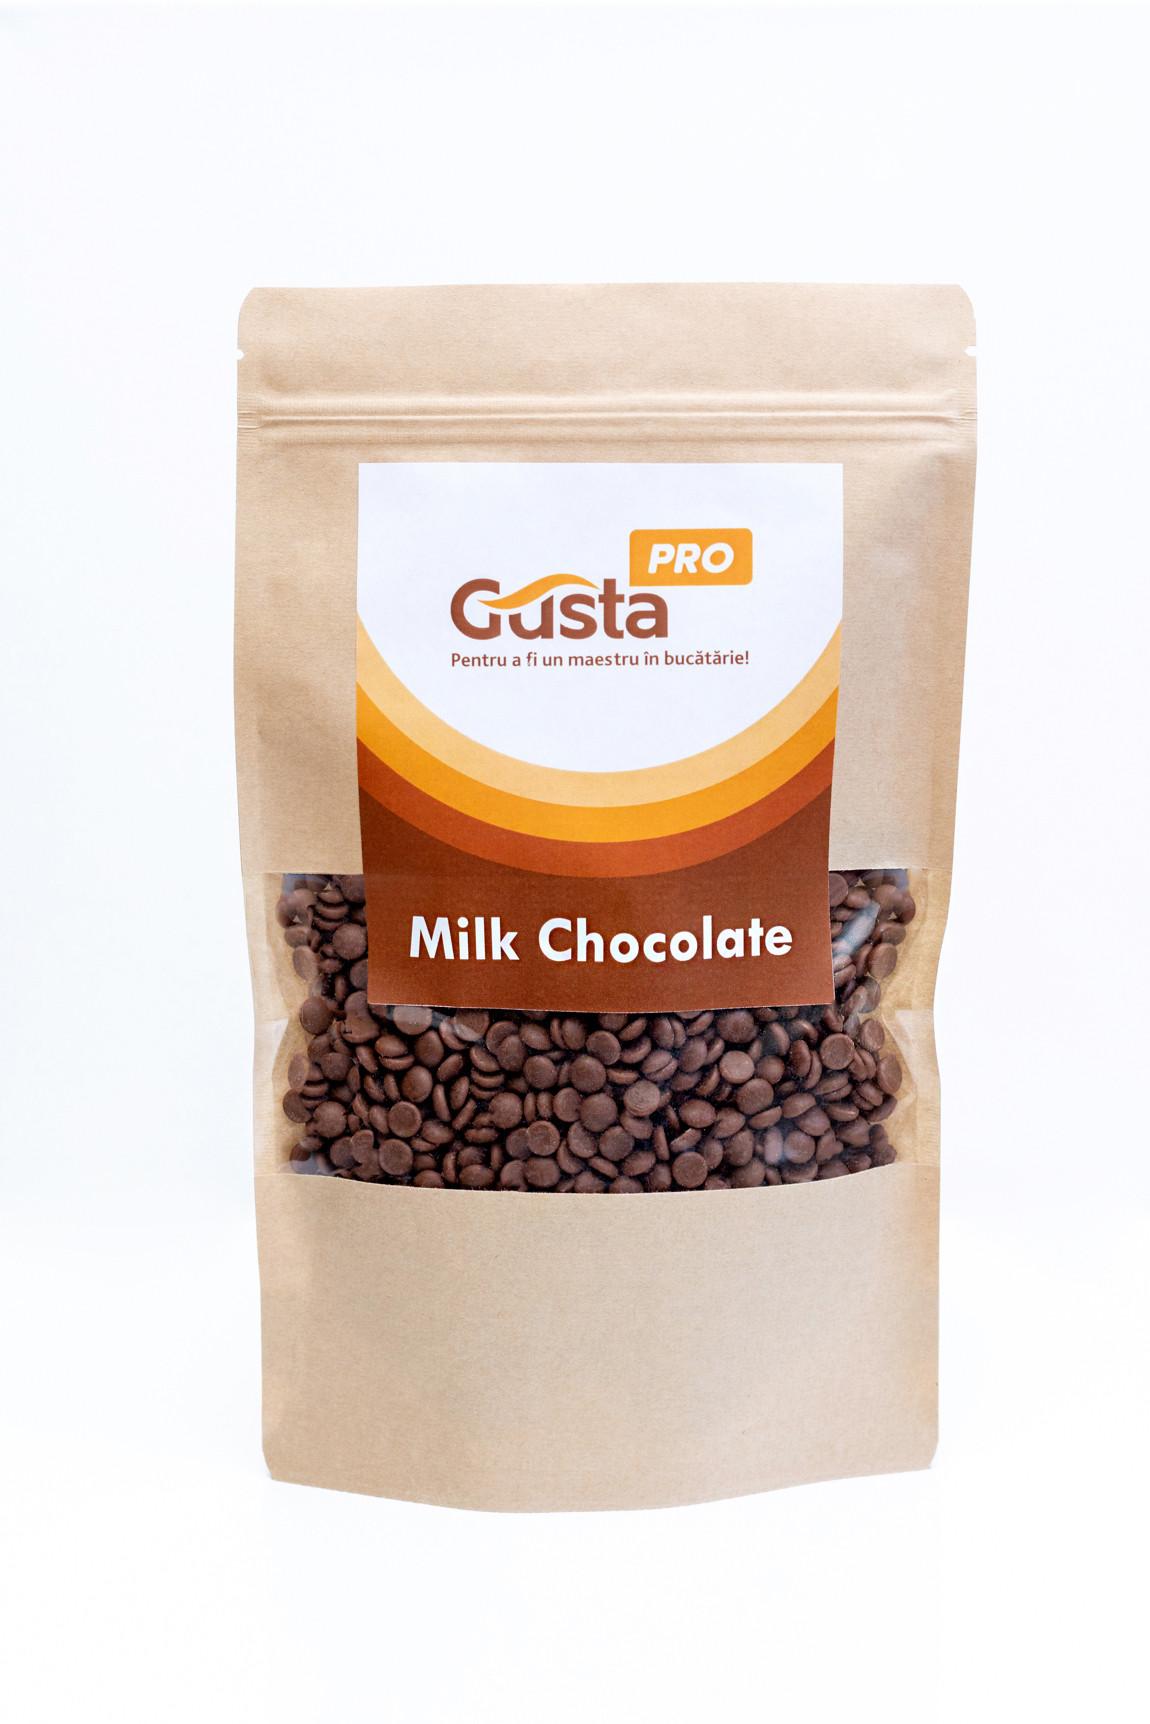 Ciocolata cu lapte belgiana 34%  GustaPro 250g